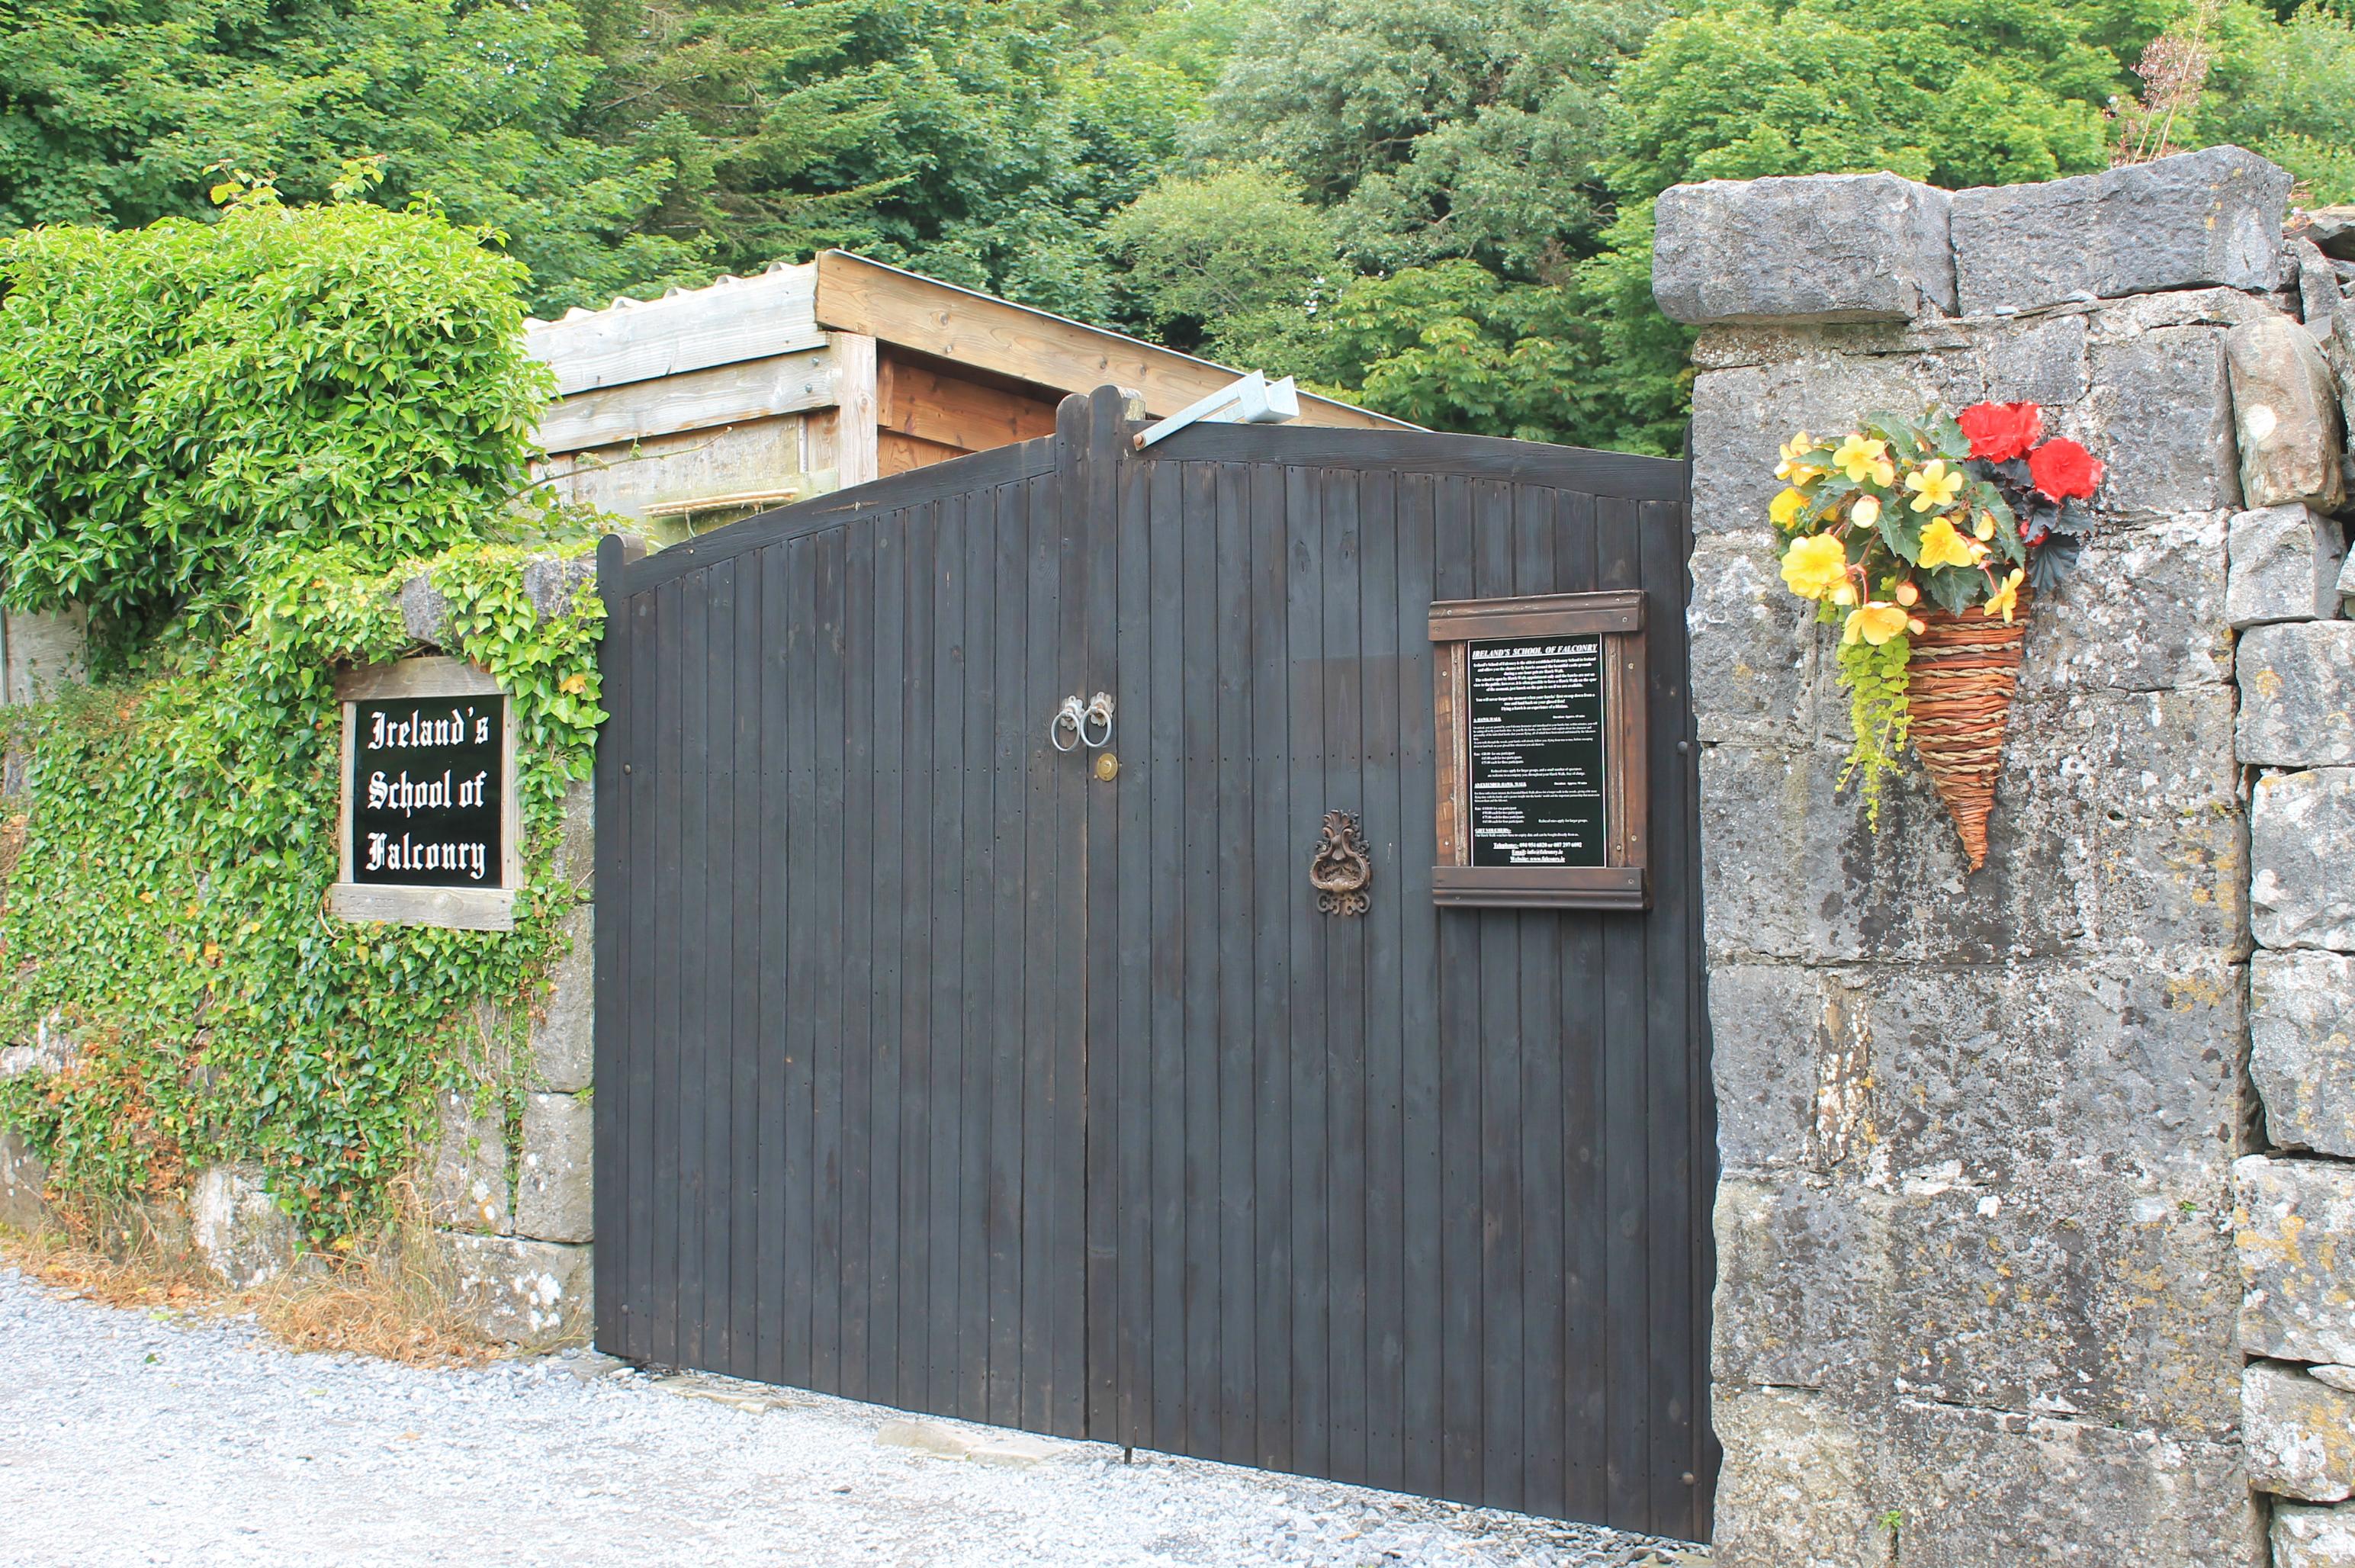 Ashford Castle Hawk Walk, Ireland's School of Falconry, Things to do in Cong Ireland